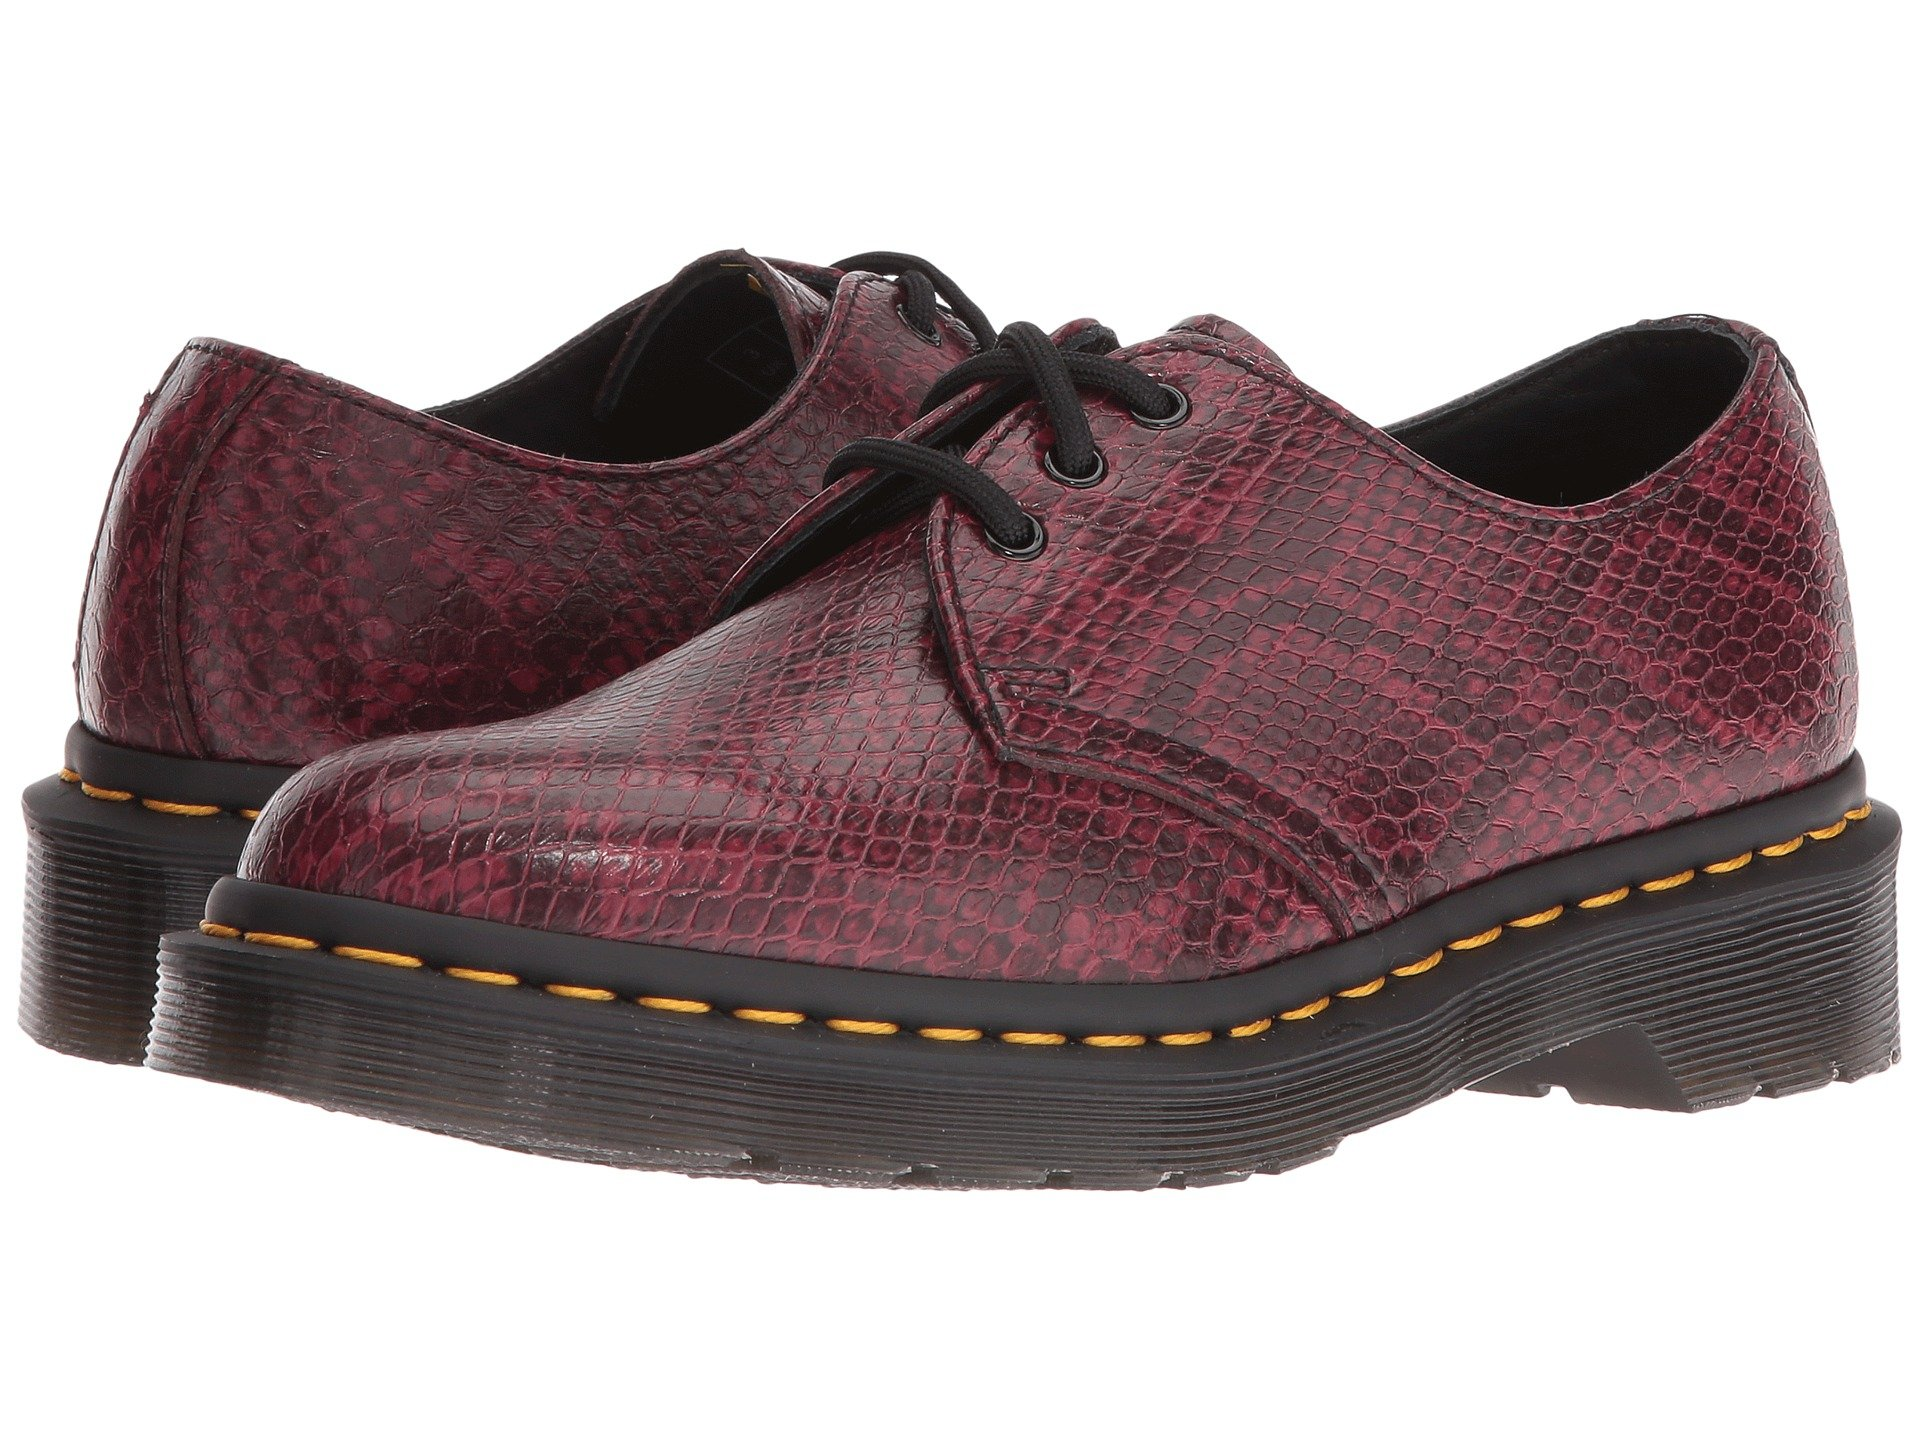 Zapato Casual para Mujer Dr. Martens 1461 Viper 3-Eye Shoe  + Dr. Martens en VeoyCompro.net